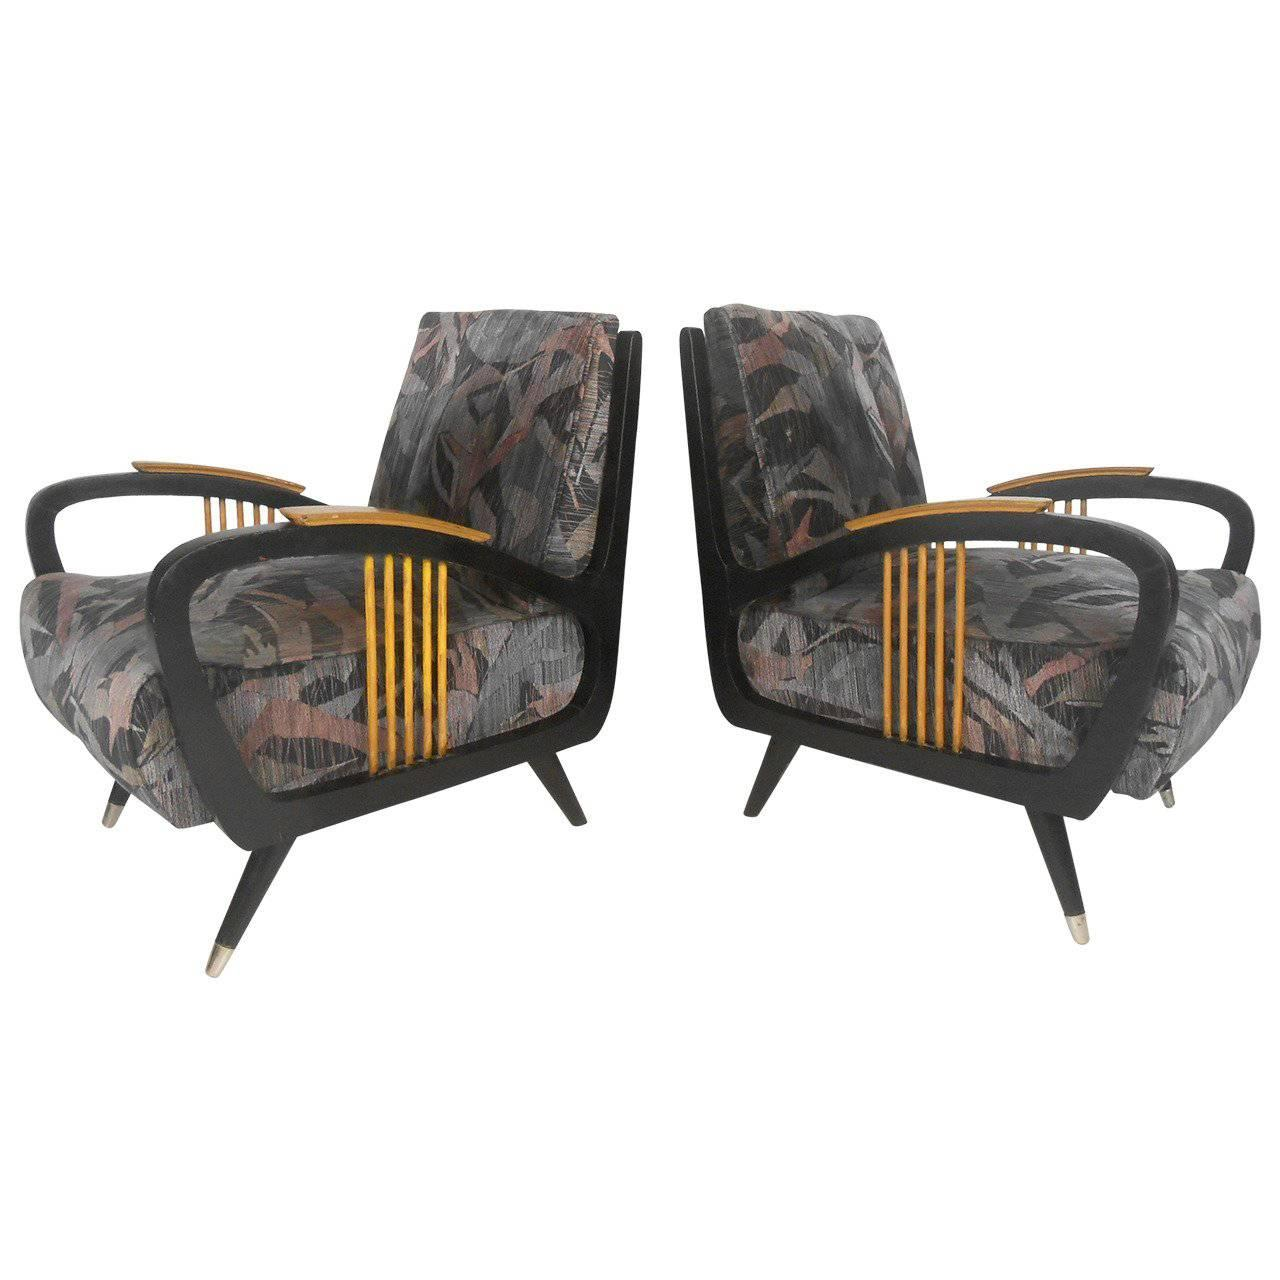 Pair of Vintage Modern Sculptural Lounge Chairs